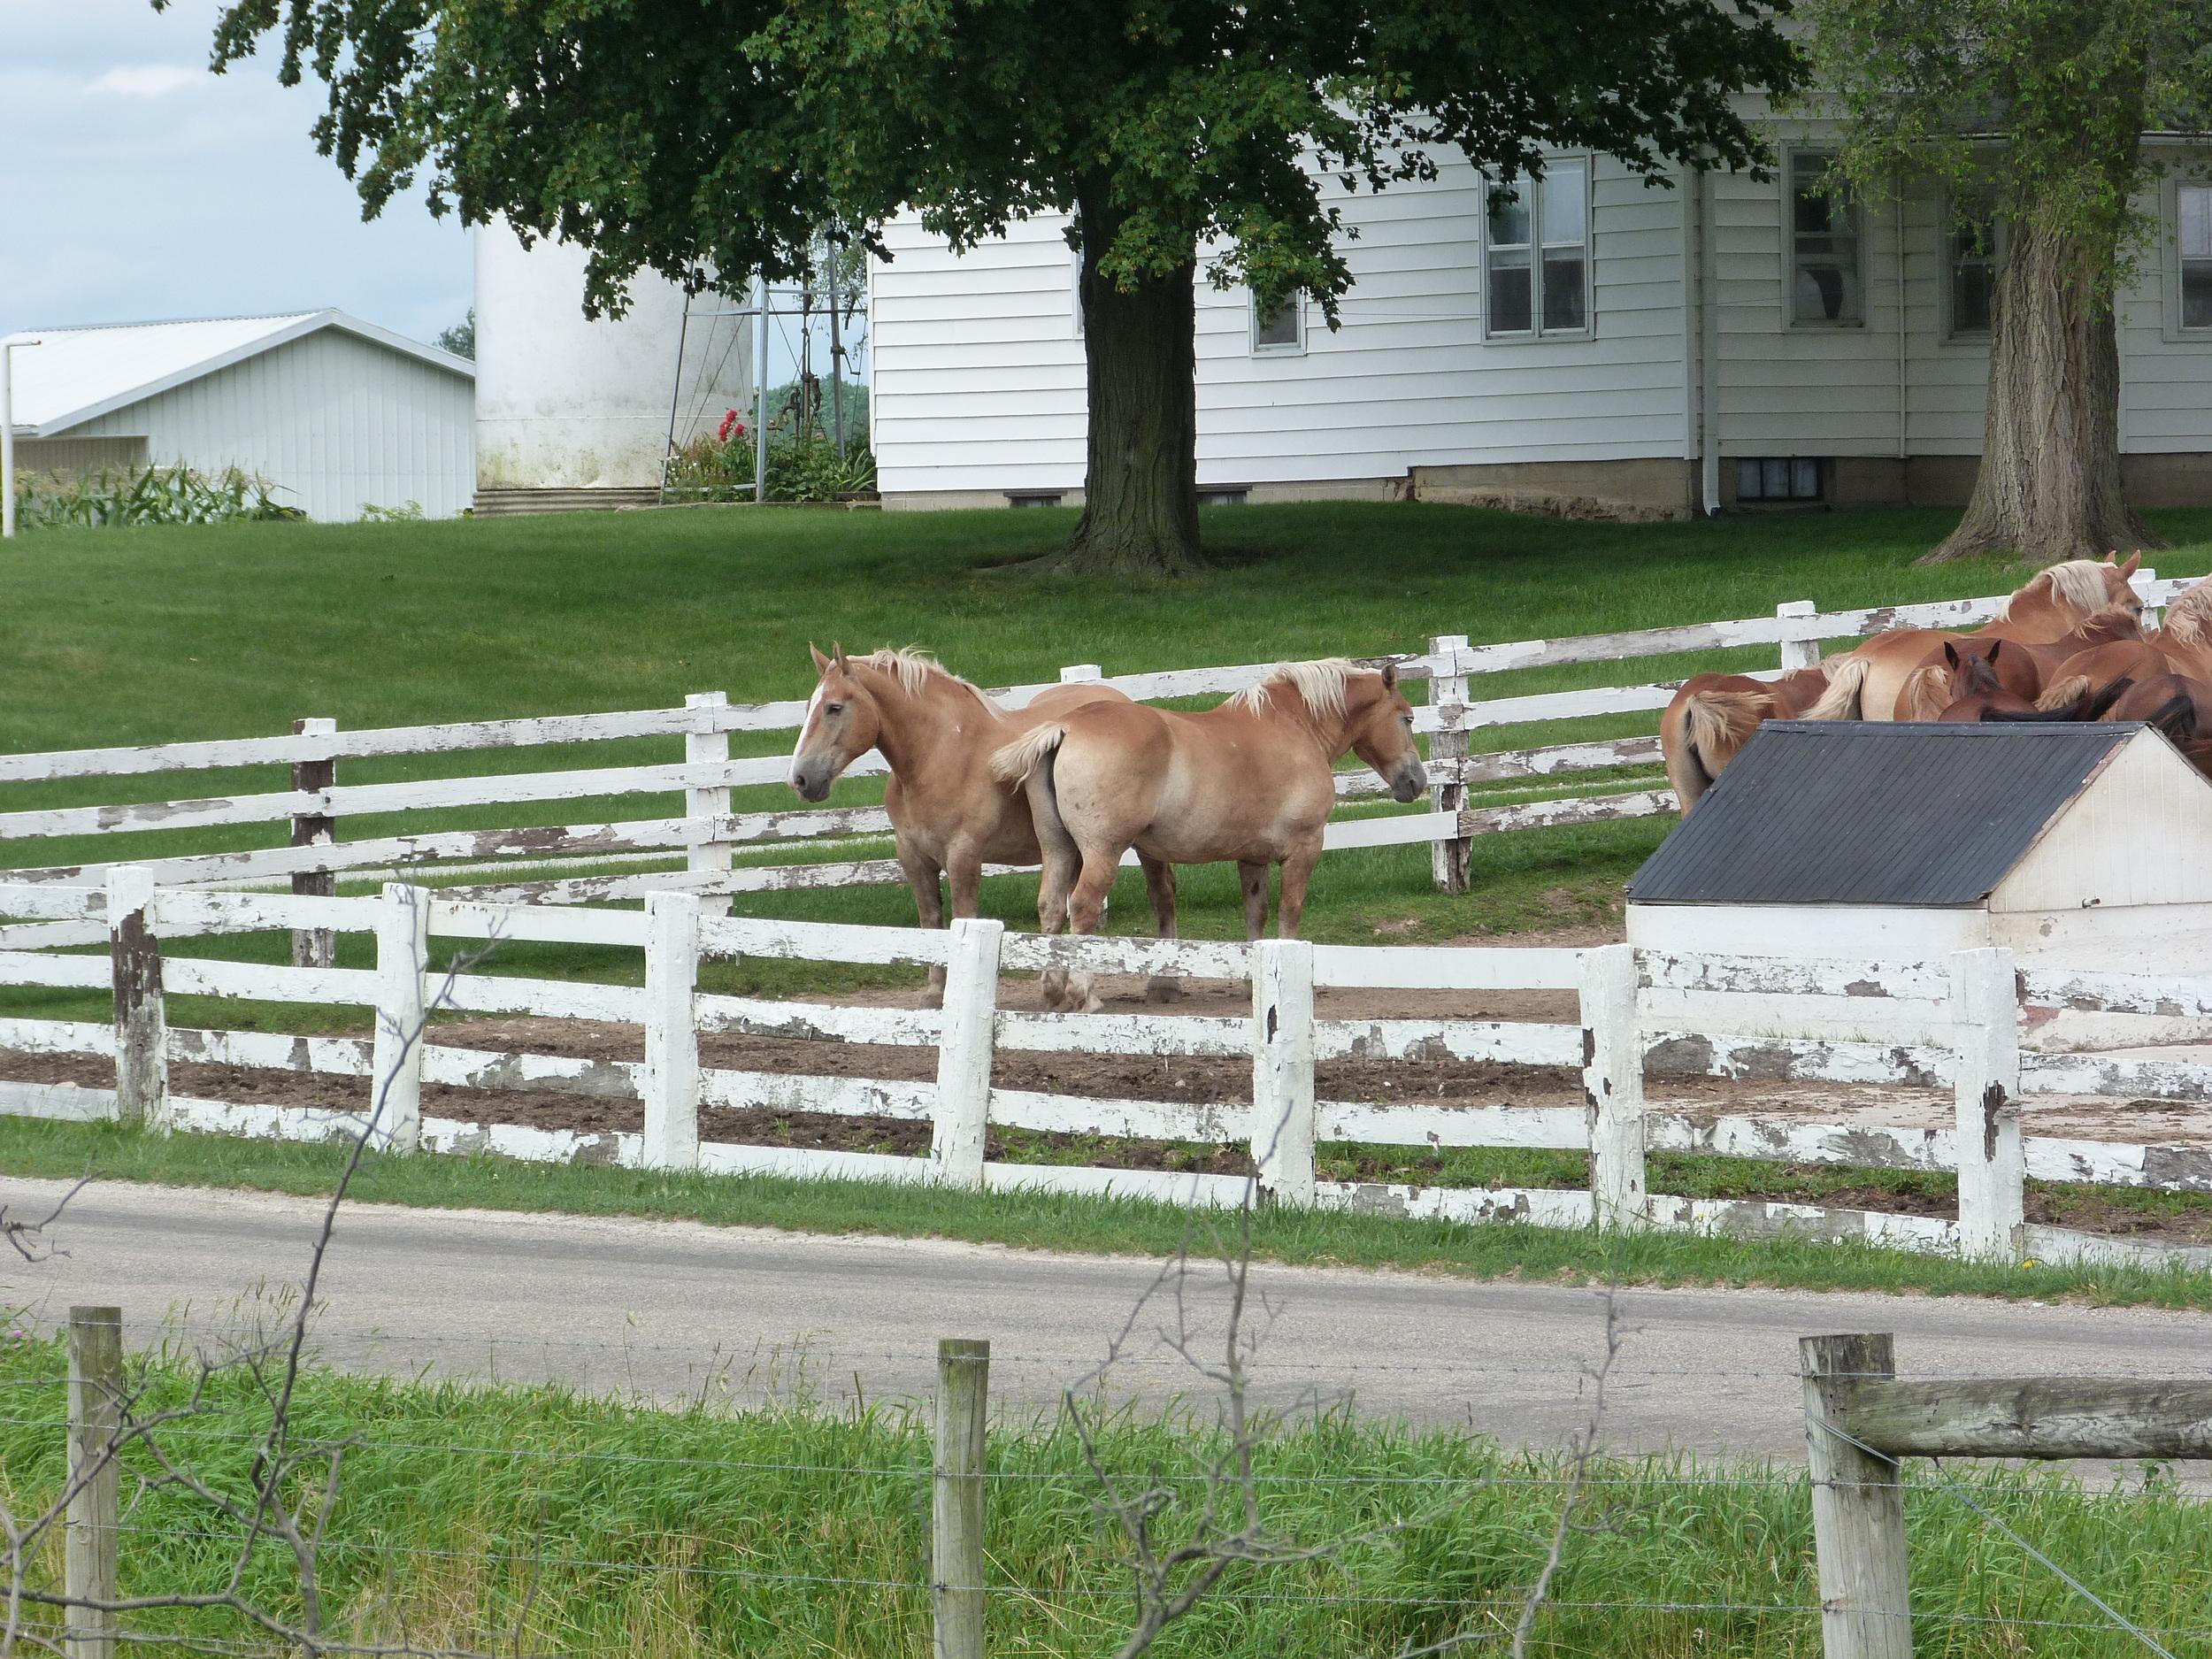 Sorrel workhorses at an Amish farm.